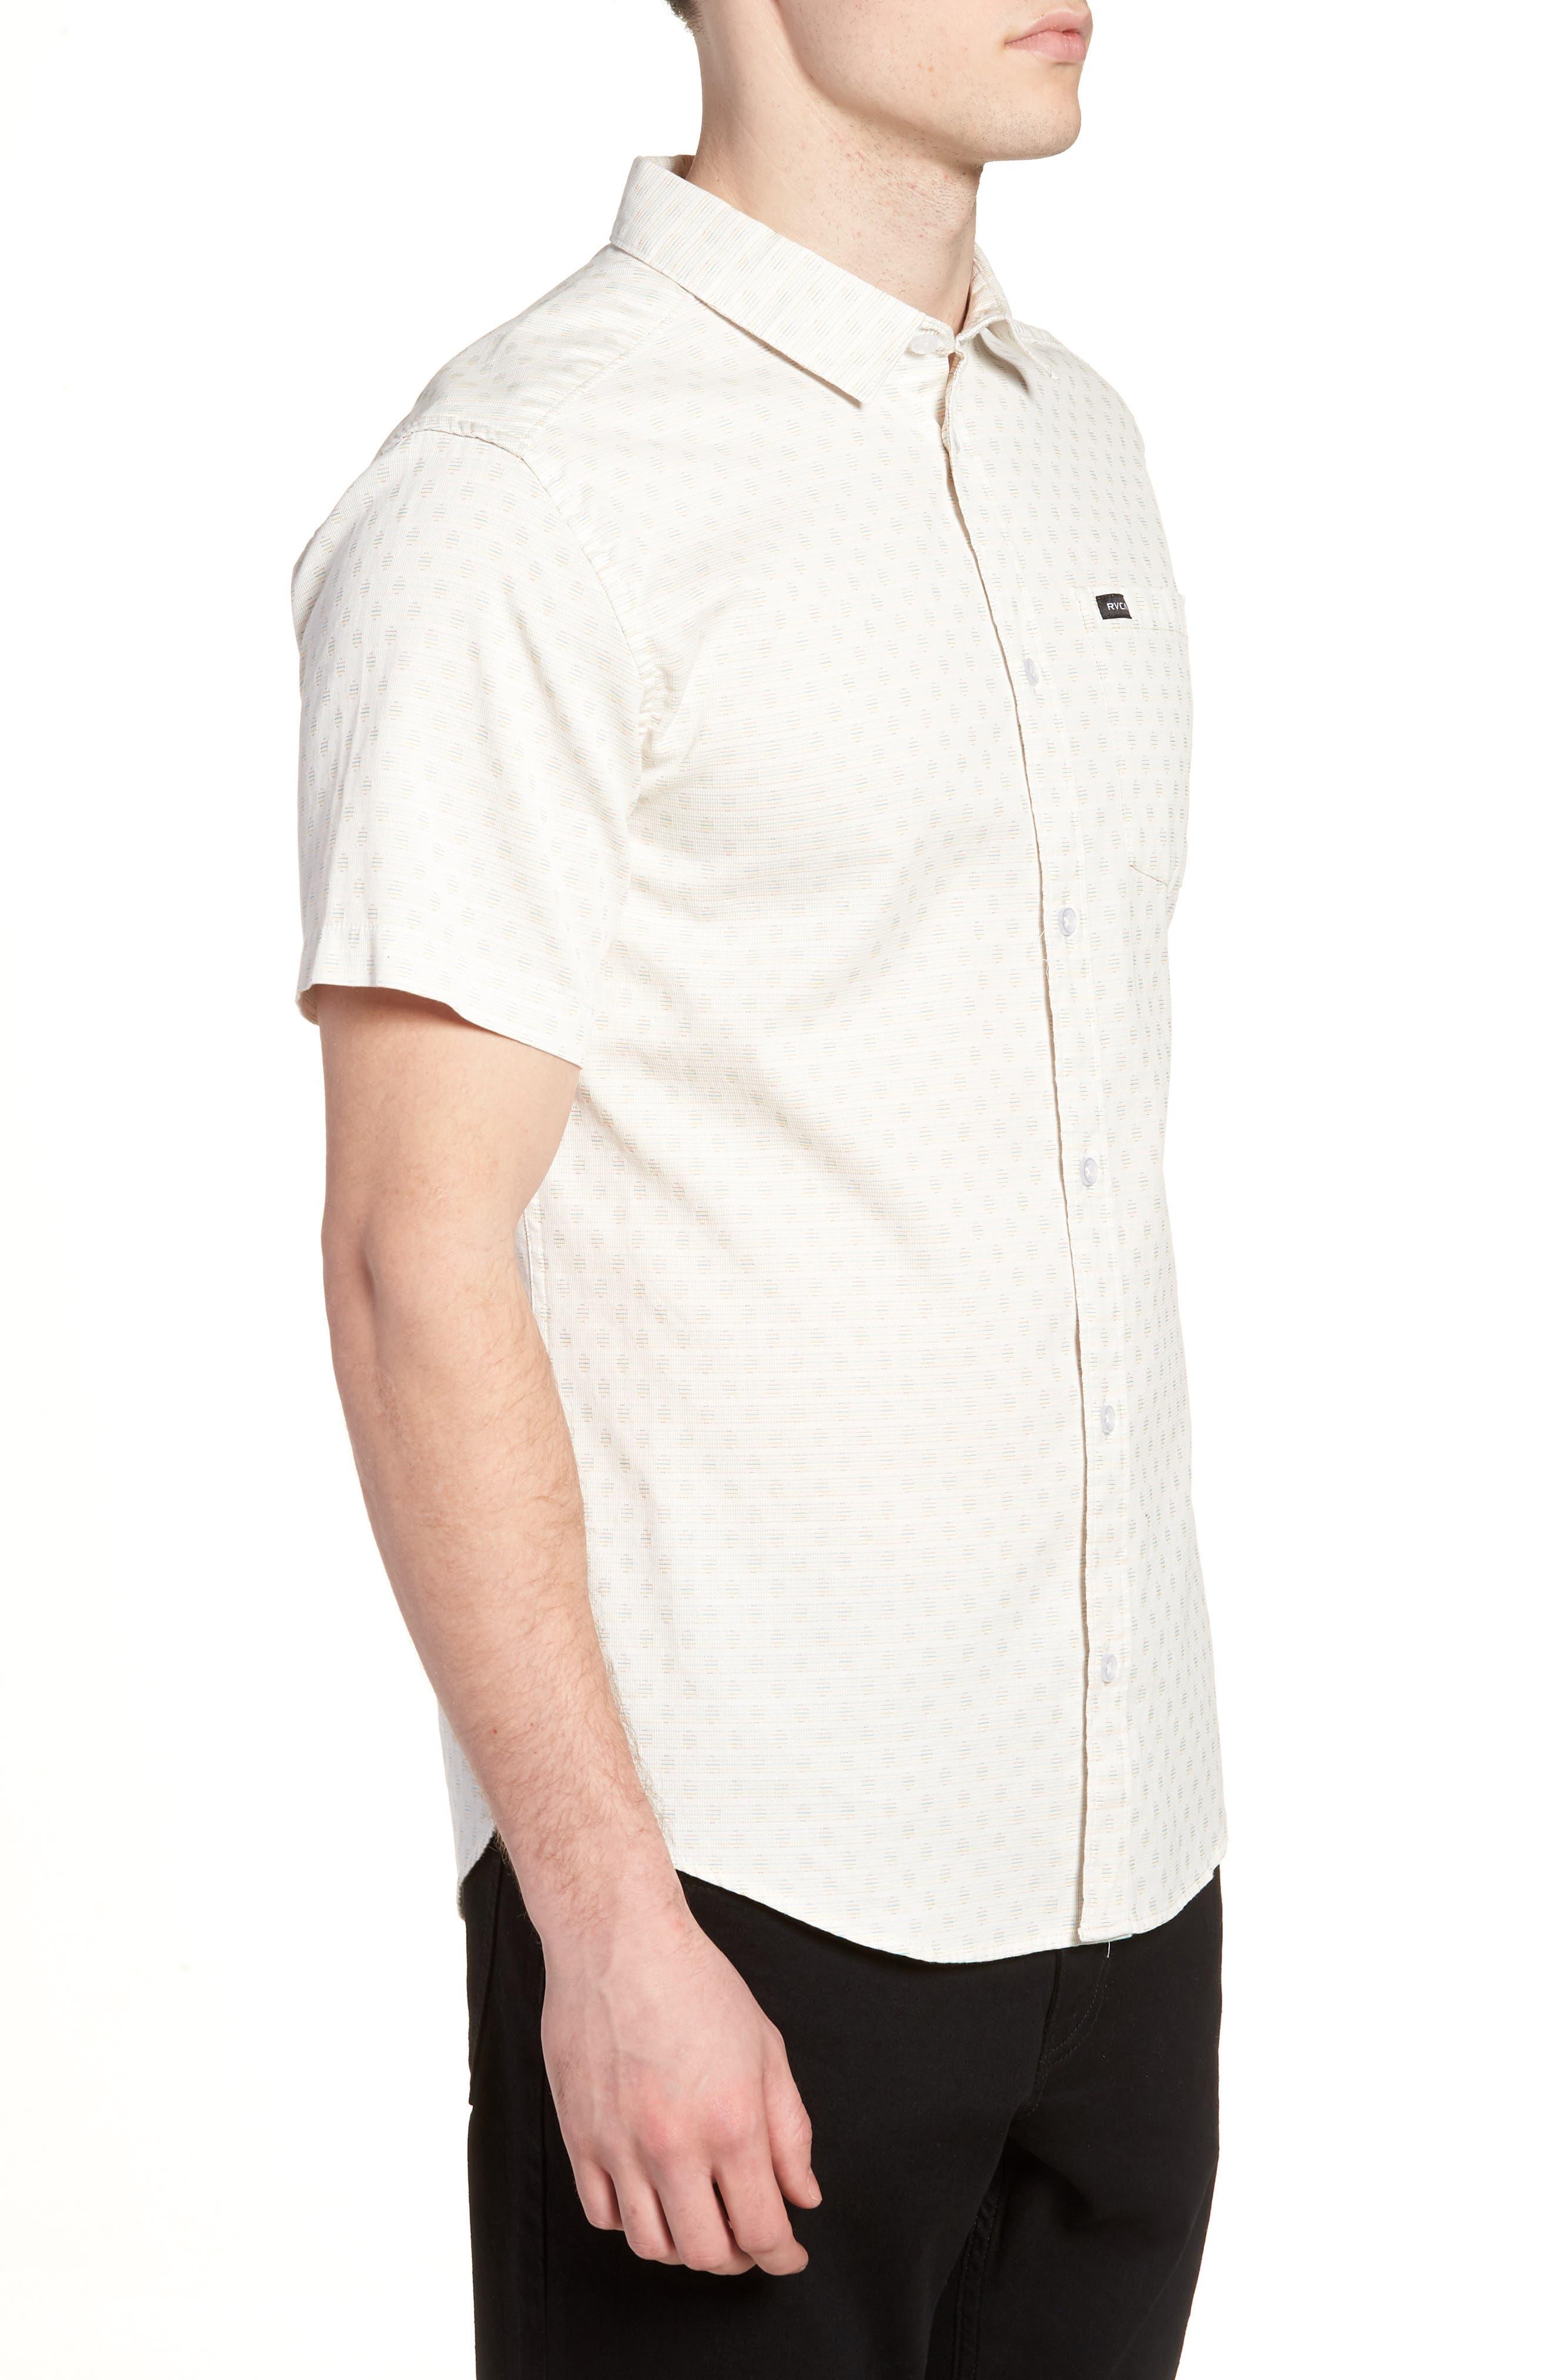 D2 Woven Shirt,                             Alternate thumbnail 3, color,                             900